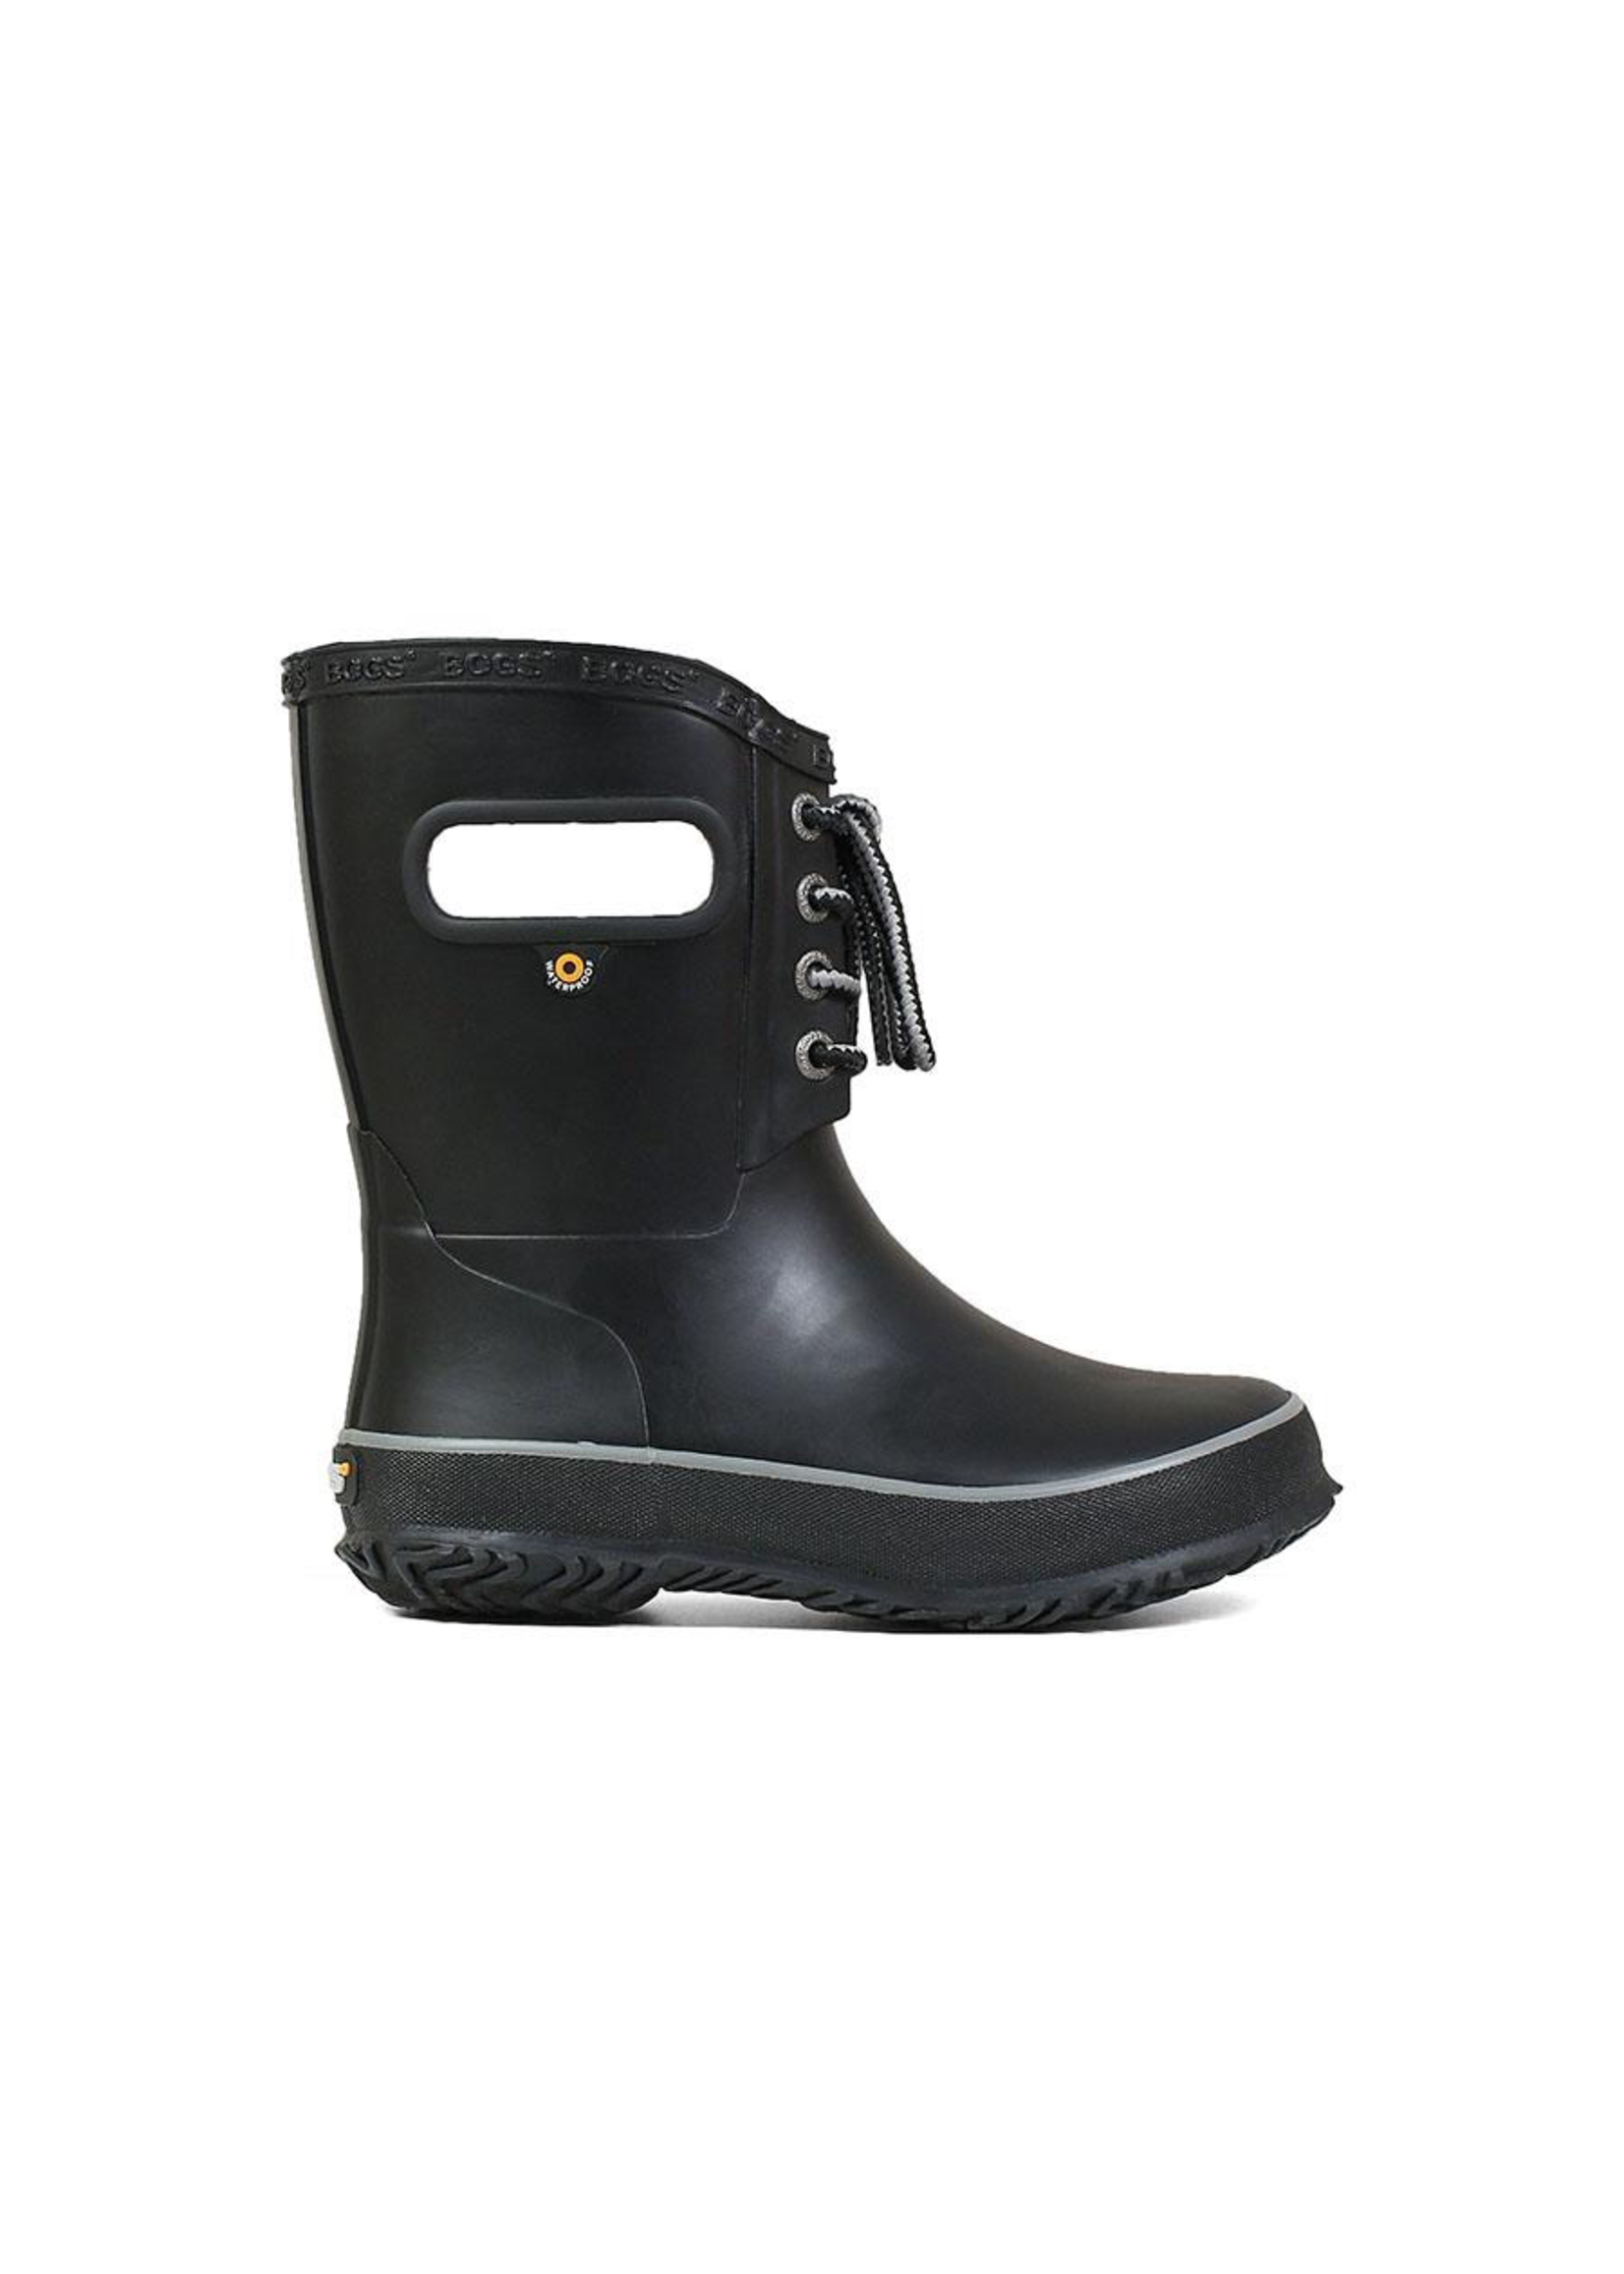 Bogs Bogs, Kids' Amanda Plush Rain Boots